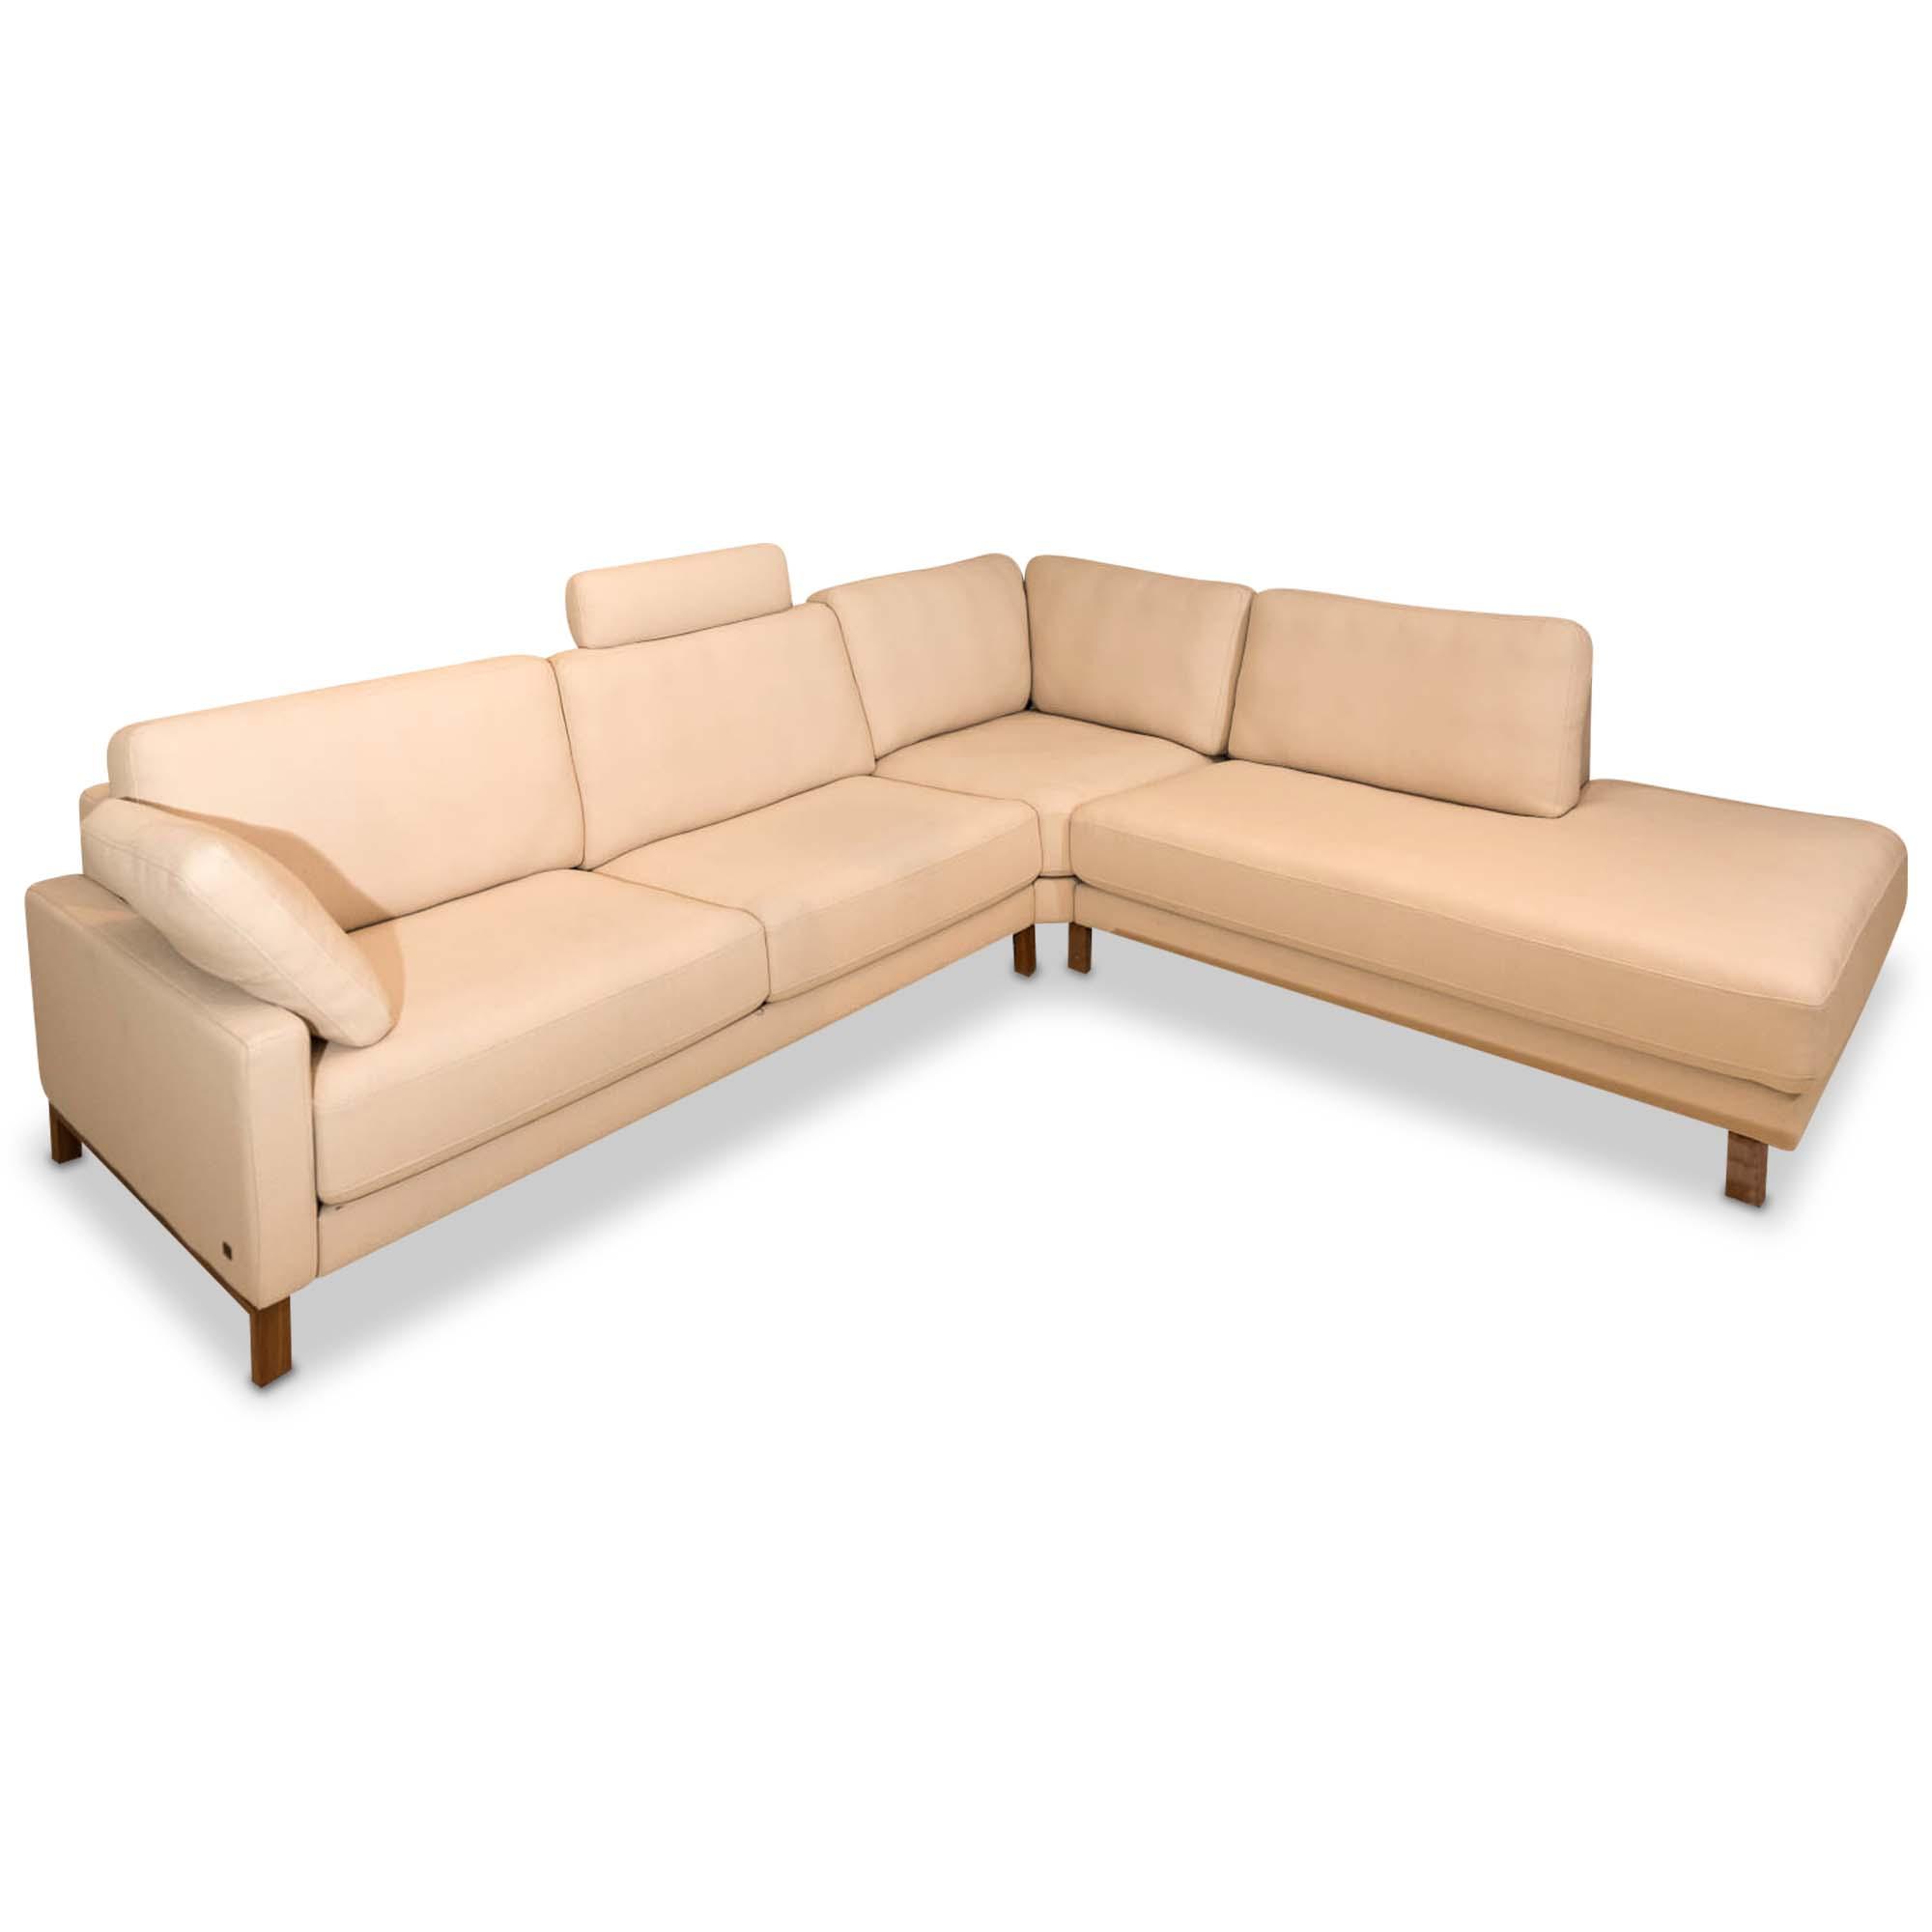 ecksofa ego in stoff beige rolf benz sofas g nstig kaufen m belfirst. Black Bedroom Furniture Sets. Home Design Ideas